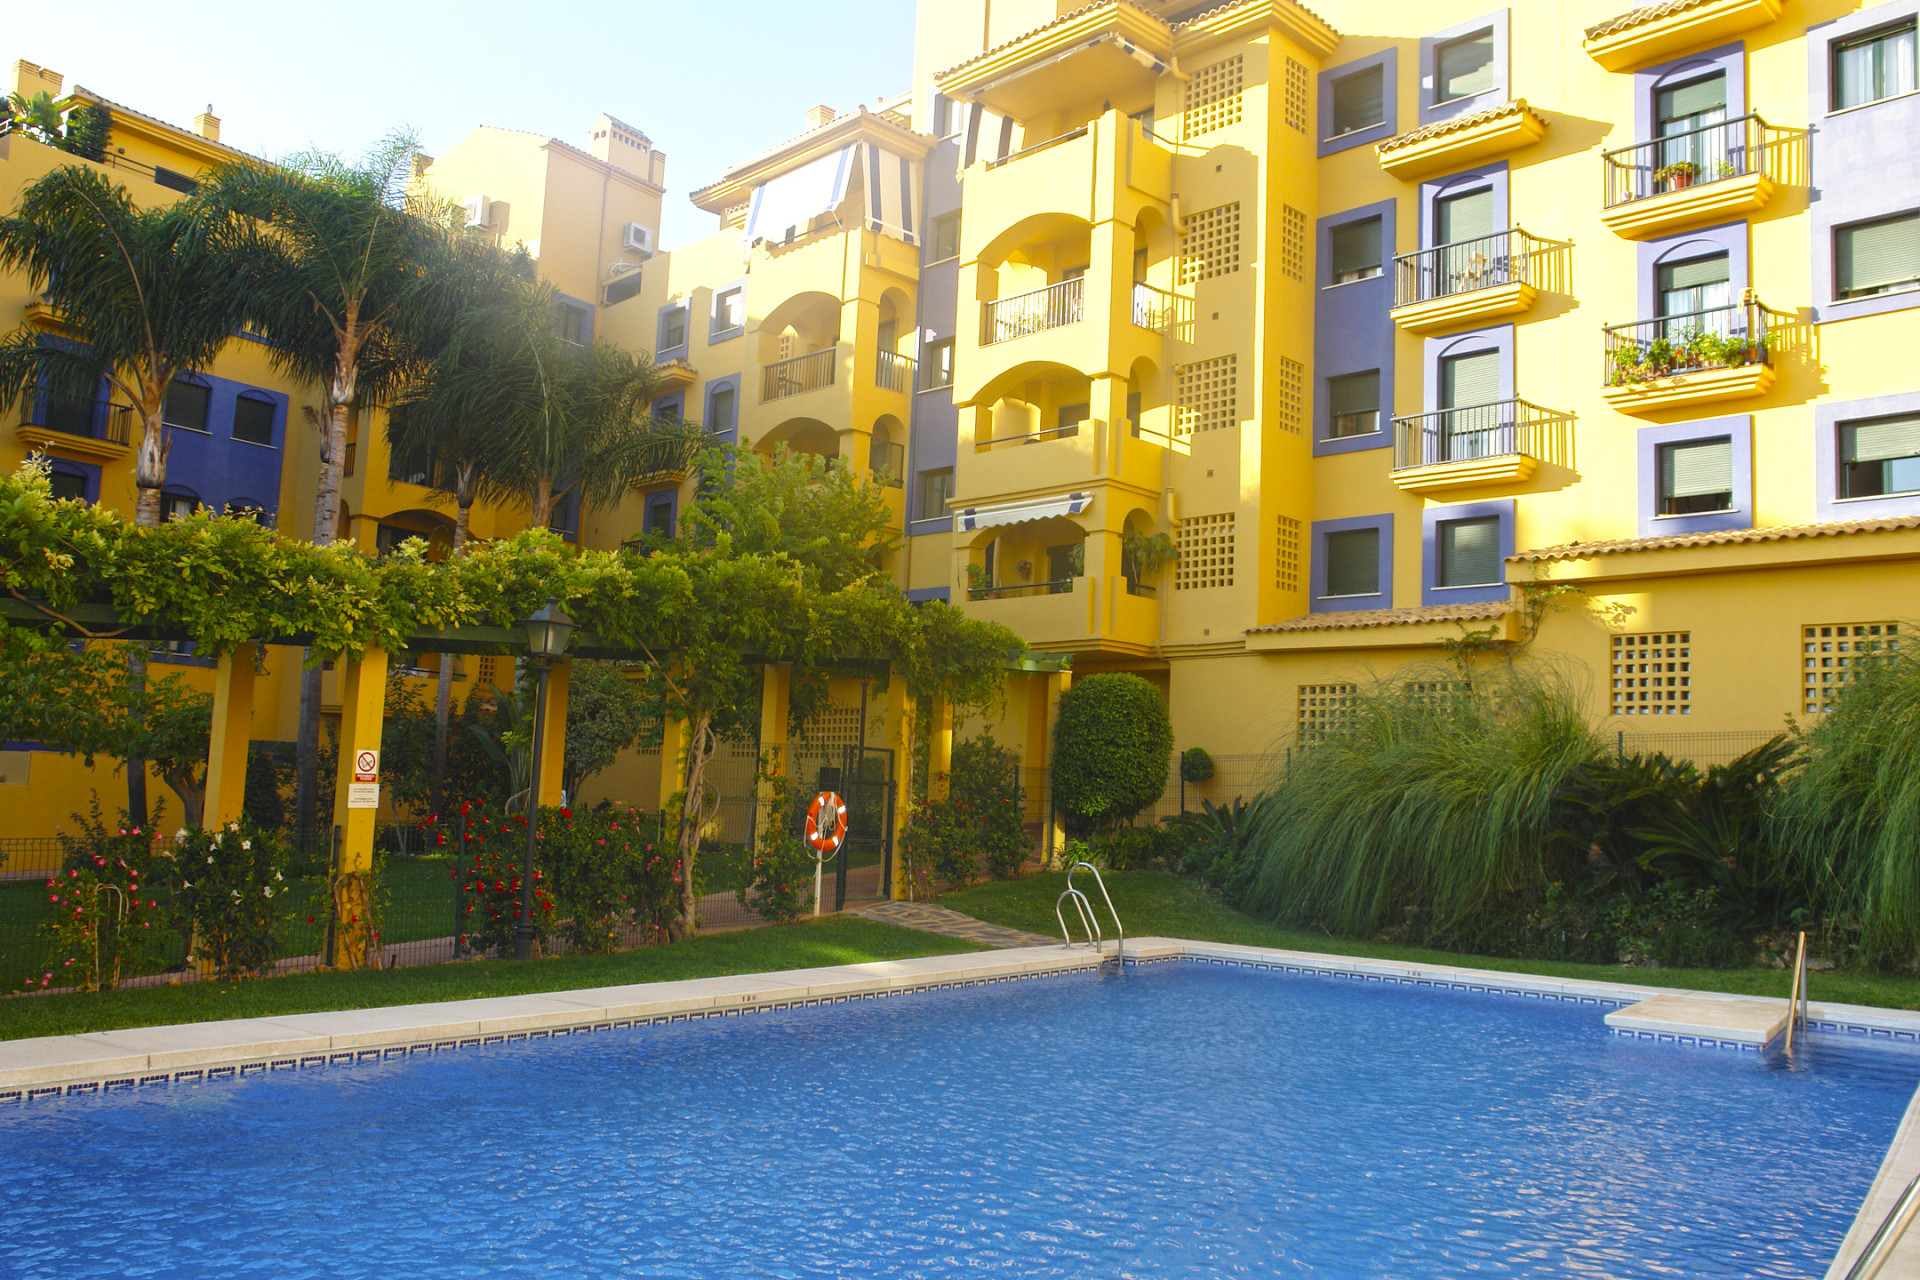 Charmant appartement in San Pedro de Alcantara